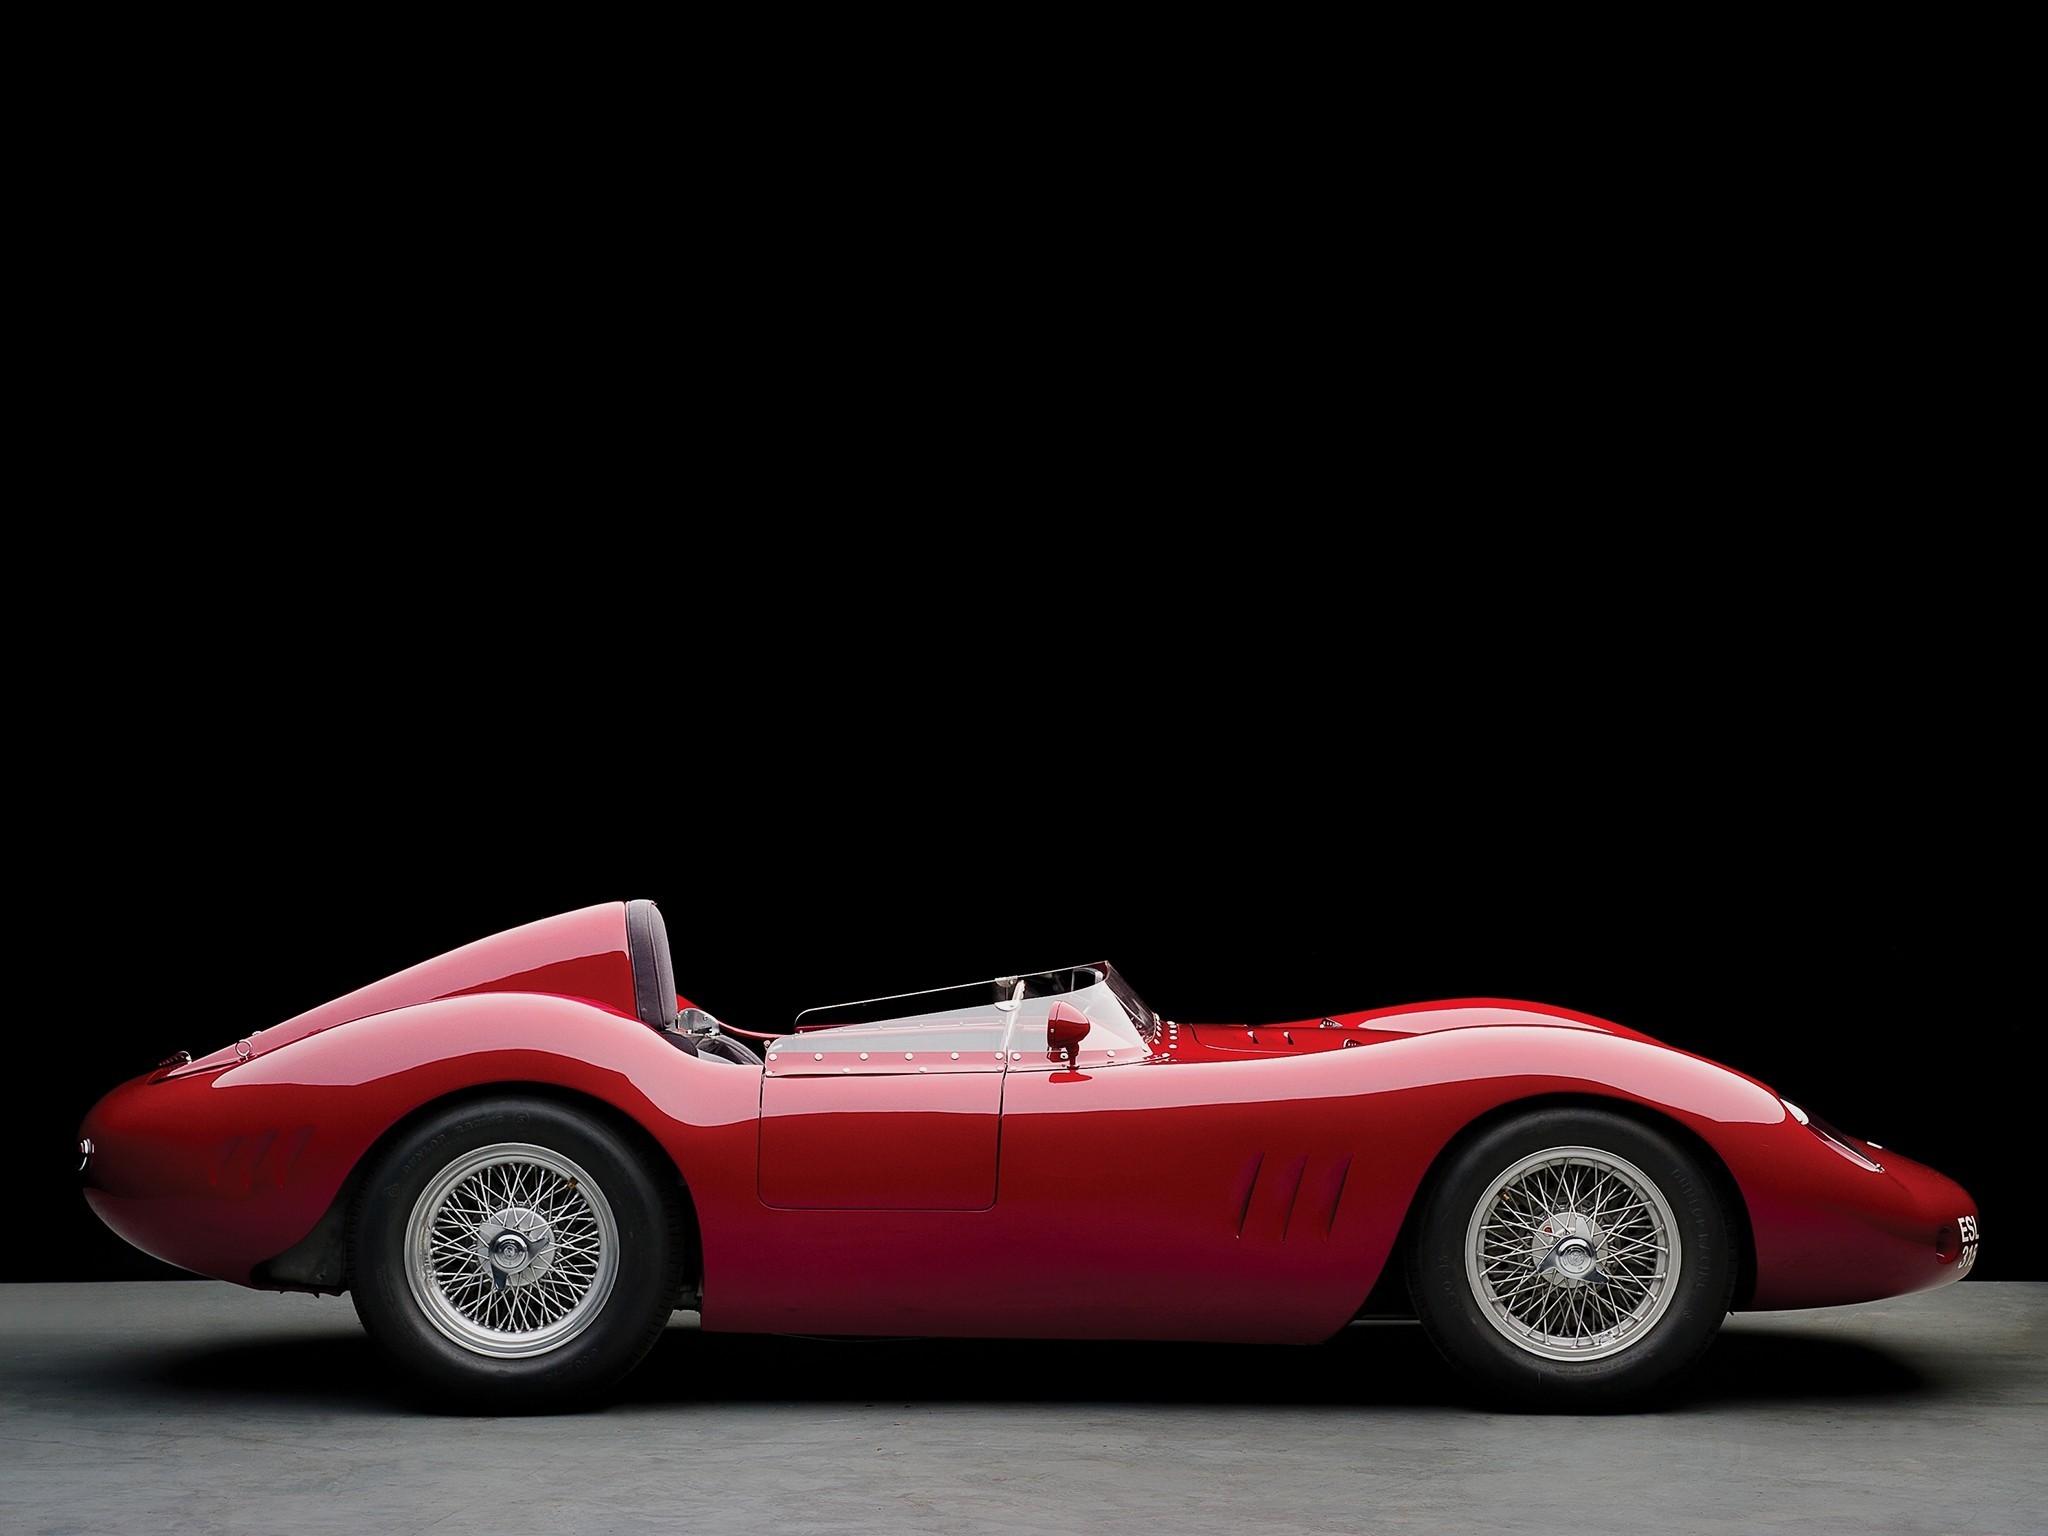 General 2048x1536 car Ferrari oldtimers vehicle